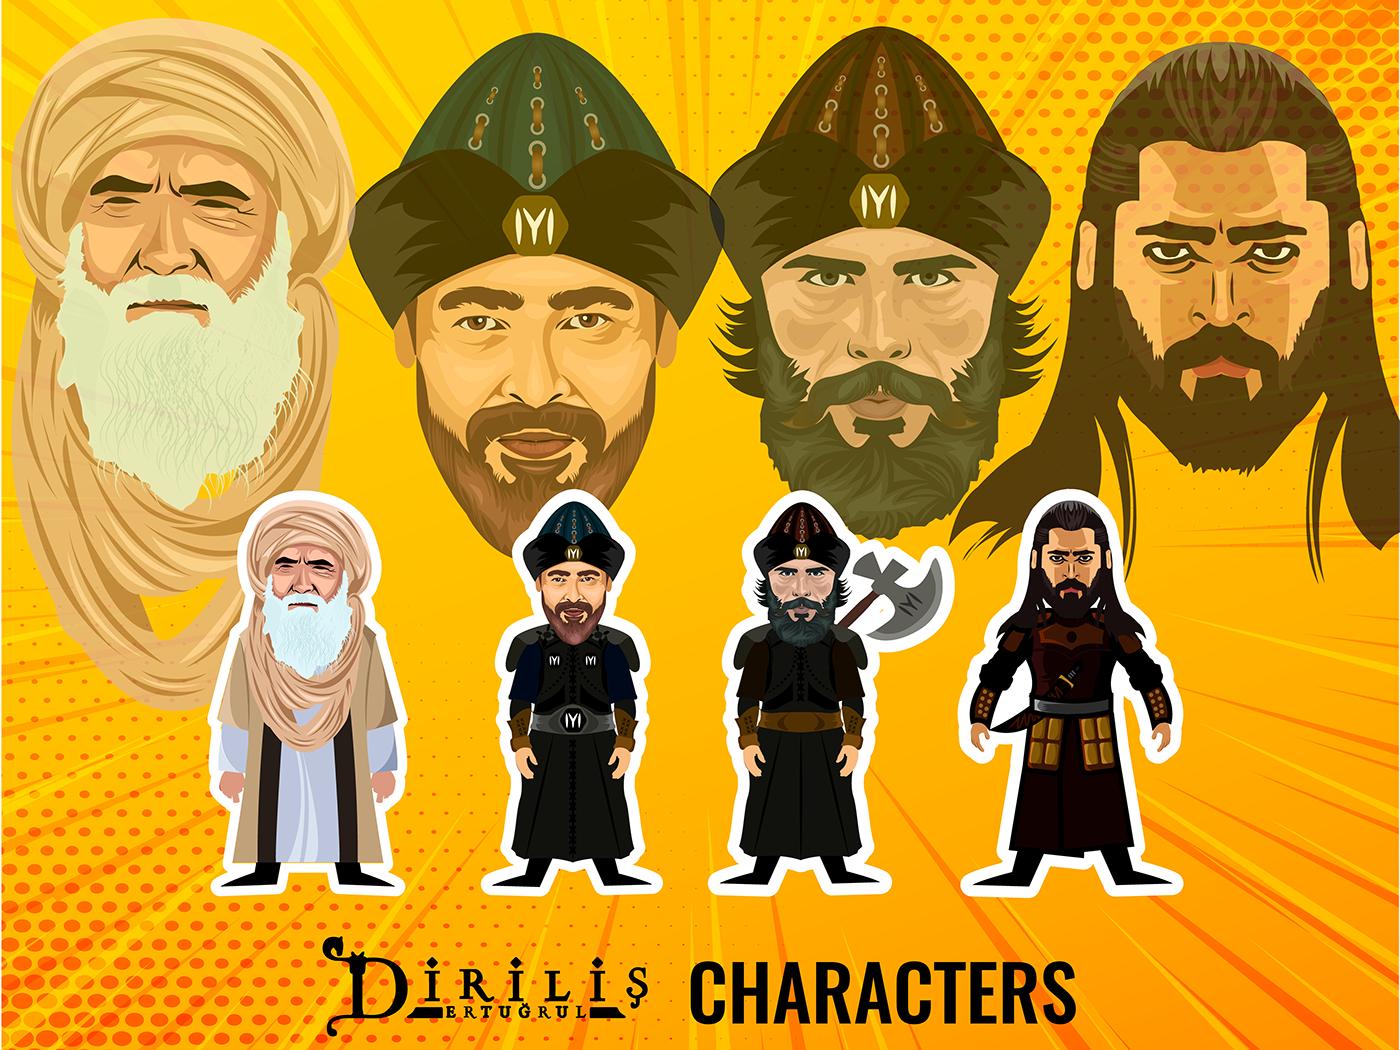 Diriliş Ertuğrul characters, caricature and vector art on Behance